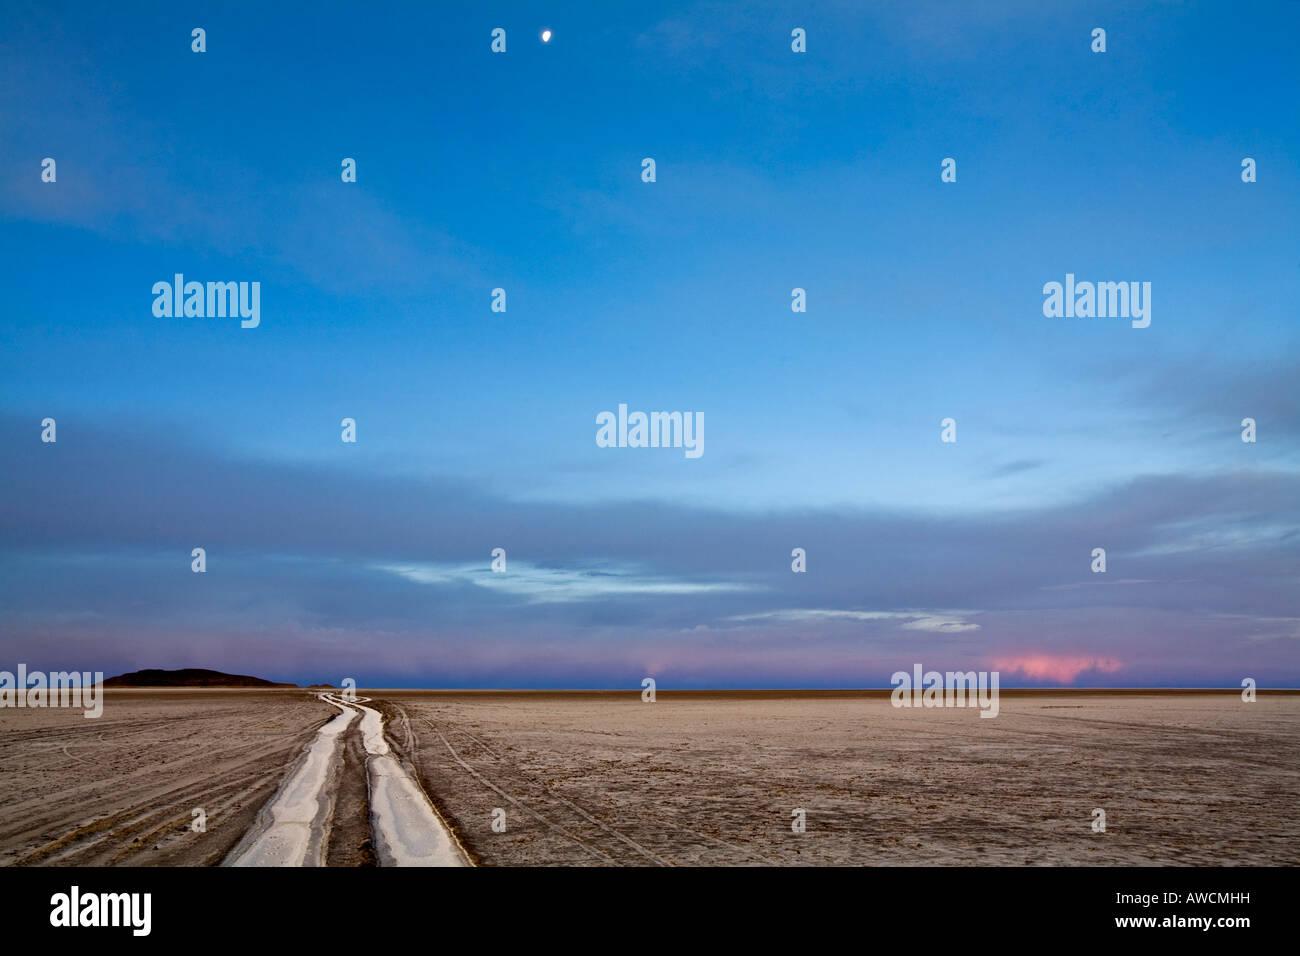 Evening vibe at salt lake Salar de Uyuni, Altiplano, Bolivia, South America - Stock Image